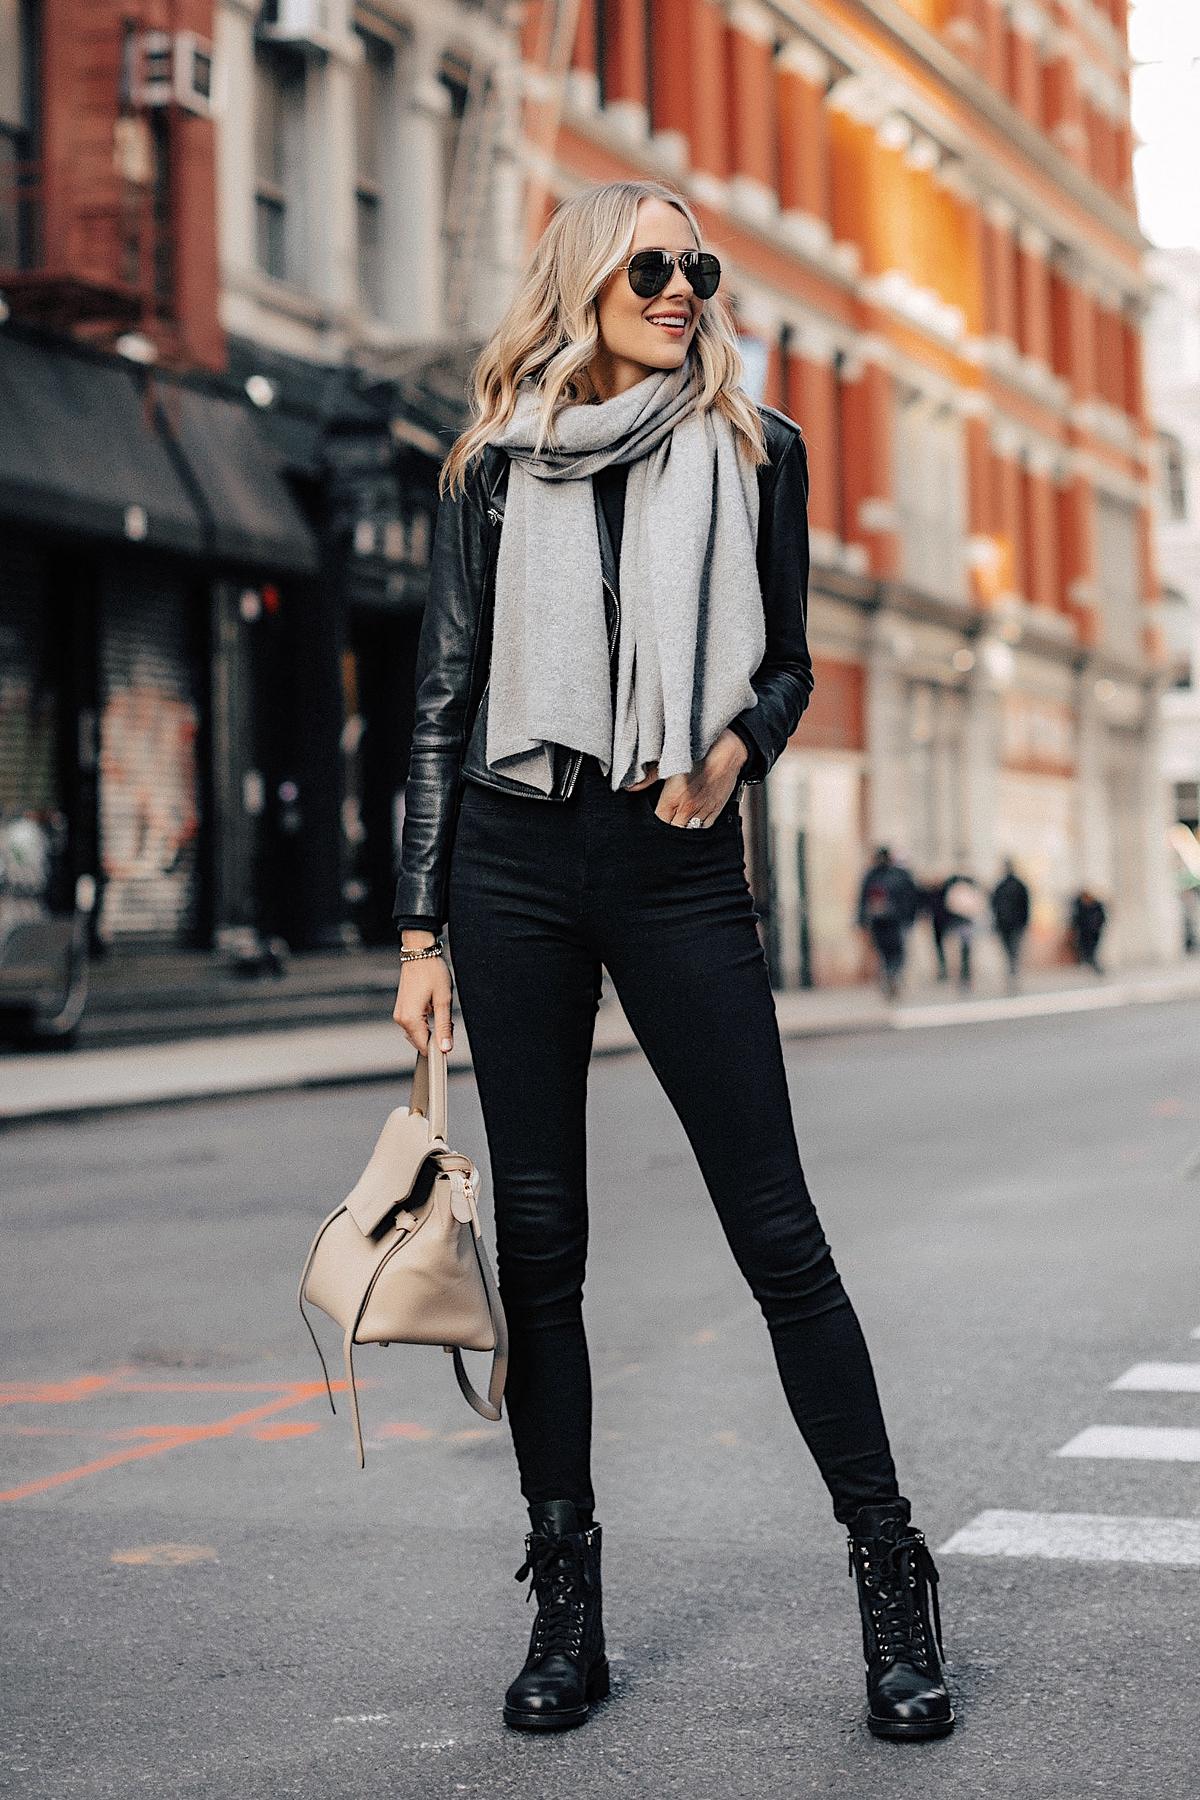 Fashion Jackson Wearing Black Leather Jacket Black Skinny Jeans Chanel Combat Boots Grey Scarf NYC Street Style 1